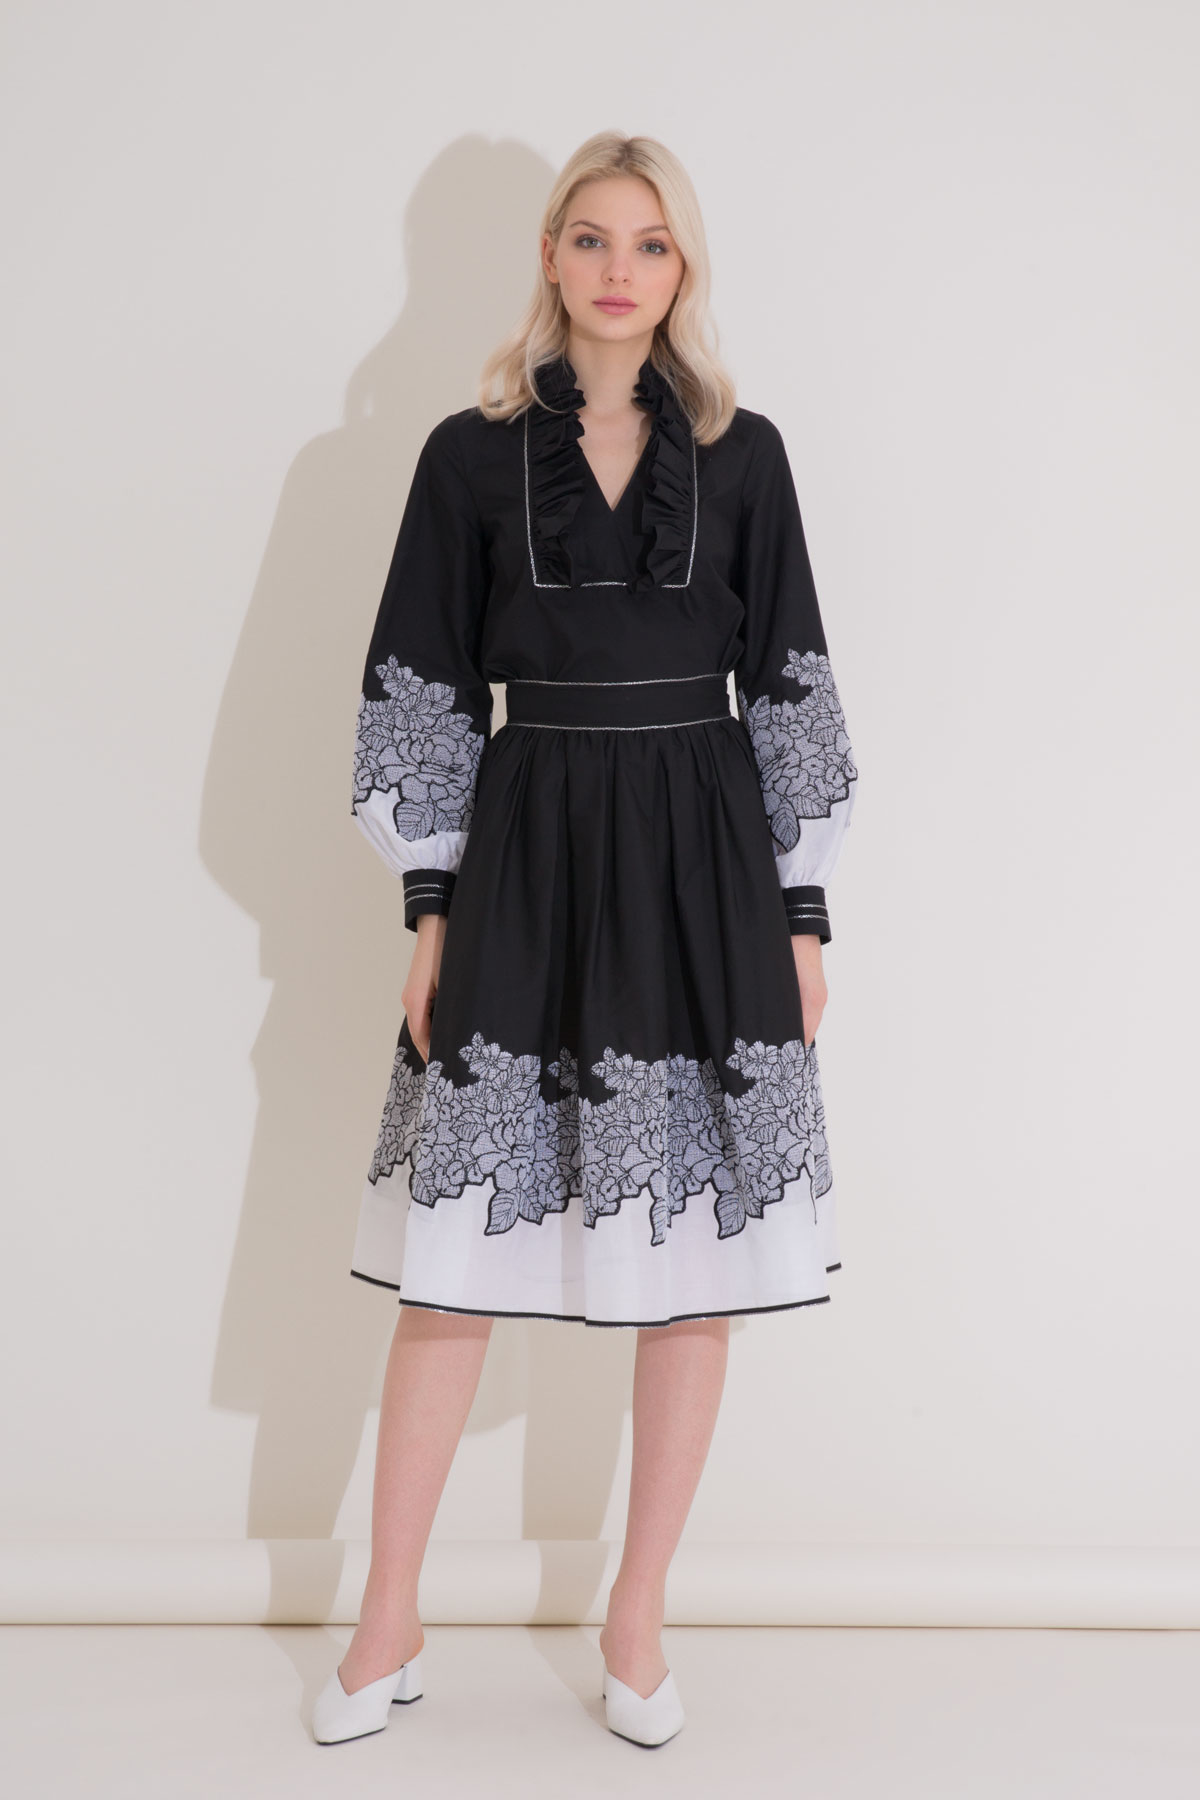 Kol Nakış ve Yaka Detaylı Siyah Poplin Bluz